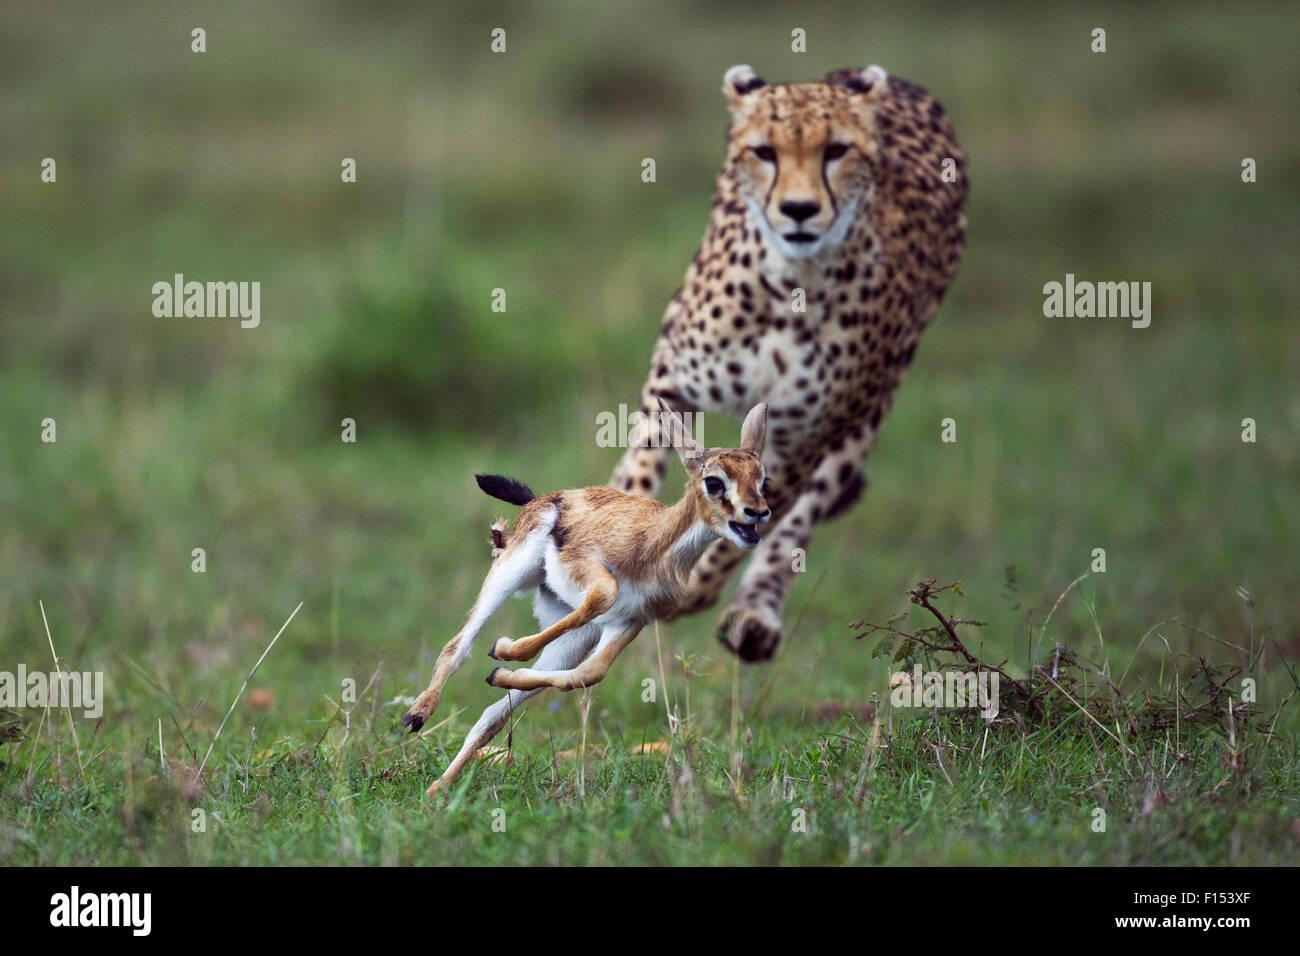 Cheetah (Acinonyx jubatus) cub aged around  one year about to bring down a Thomson's gazelle fawn (Eudorcas - Stock Image